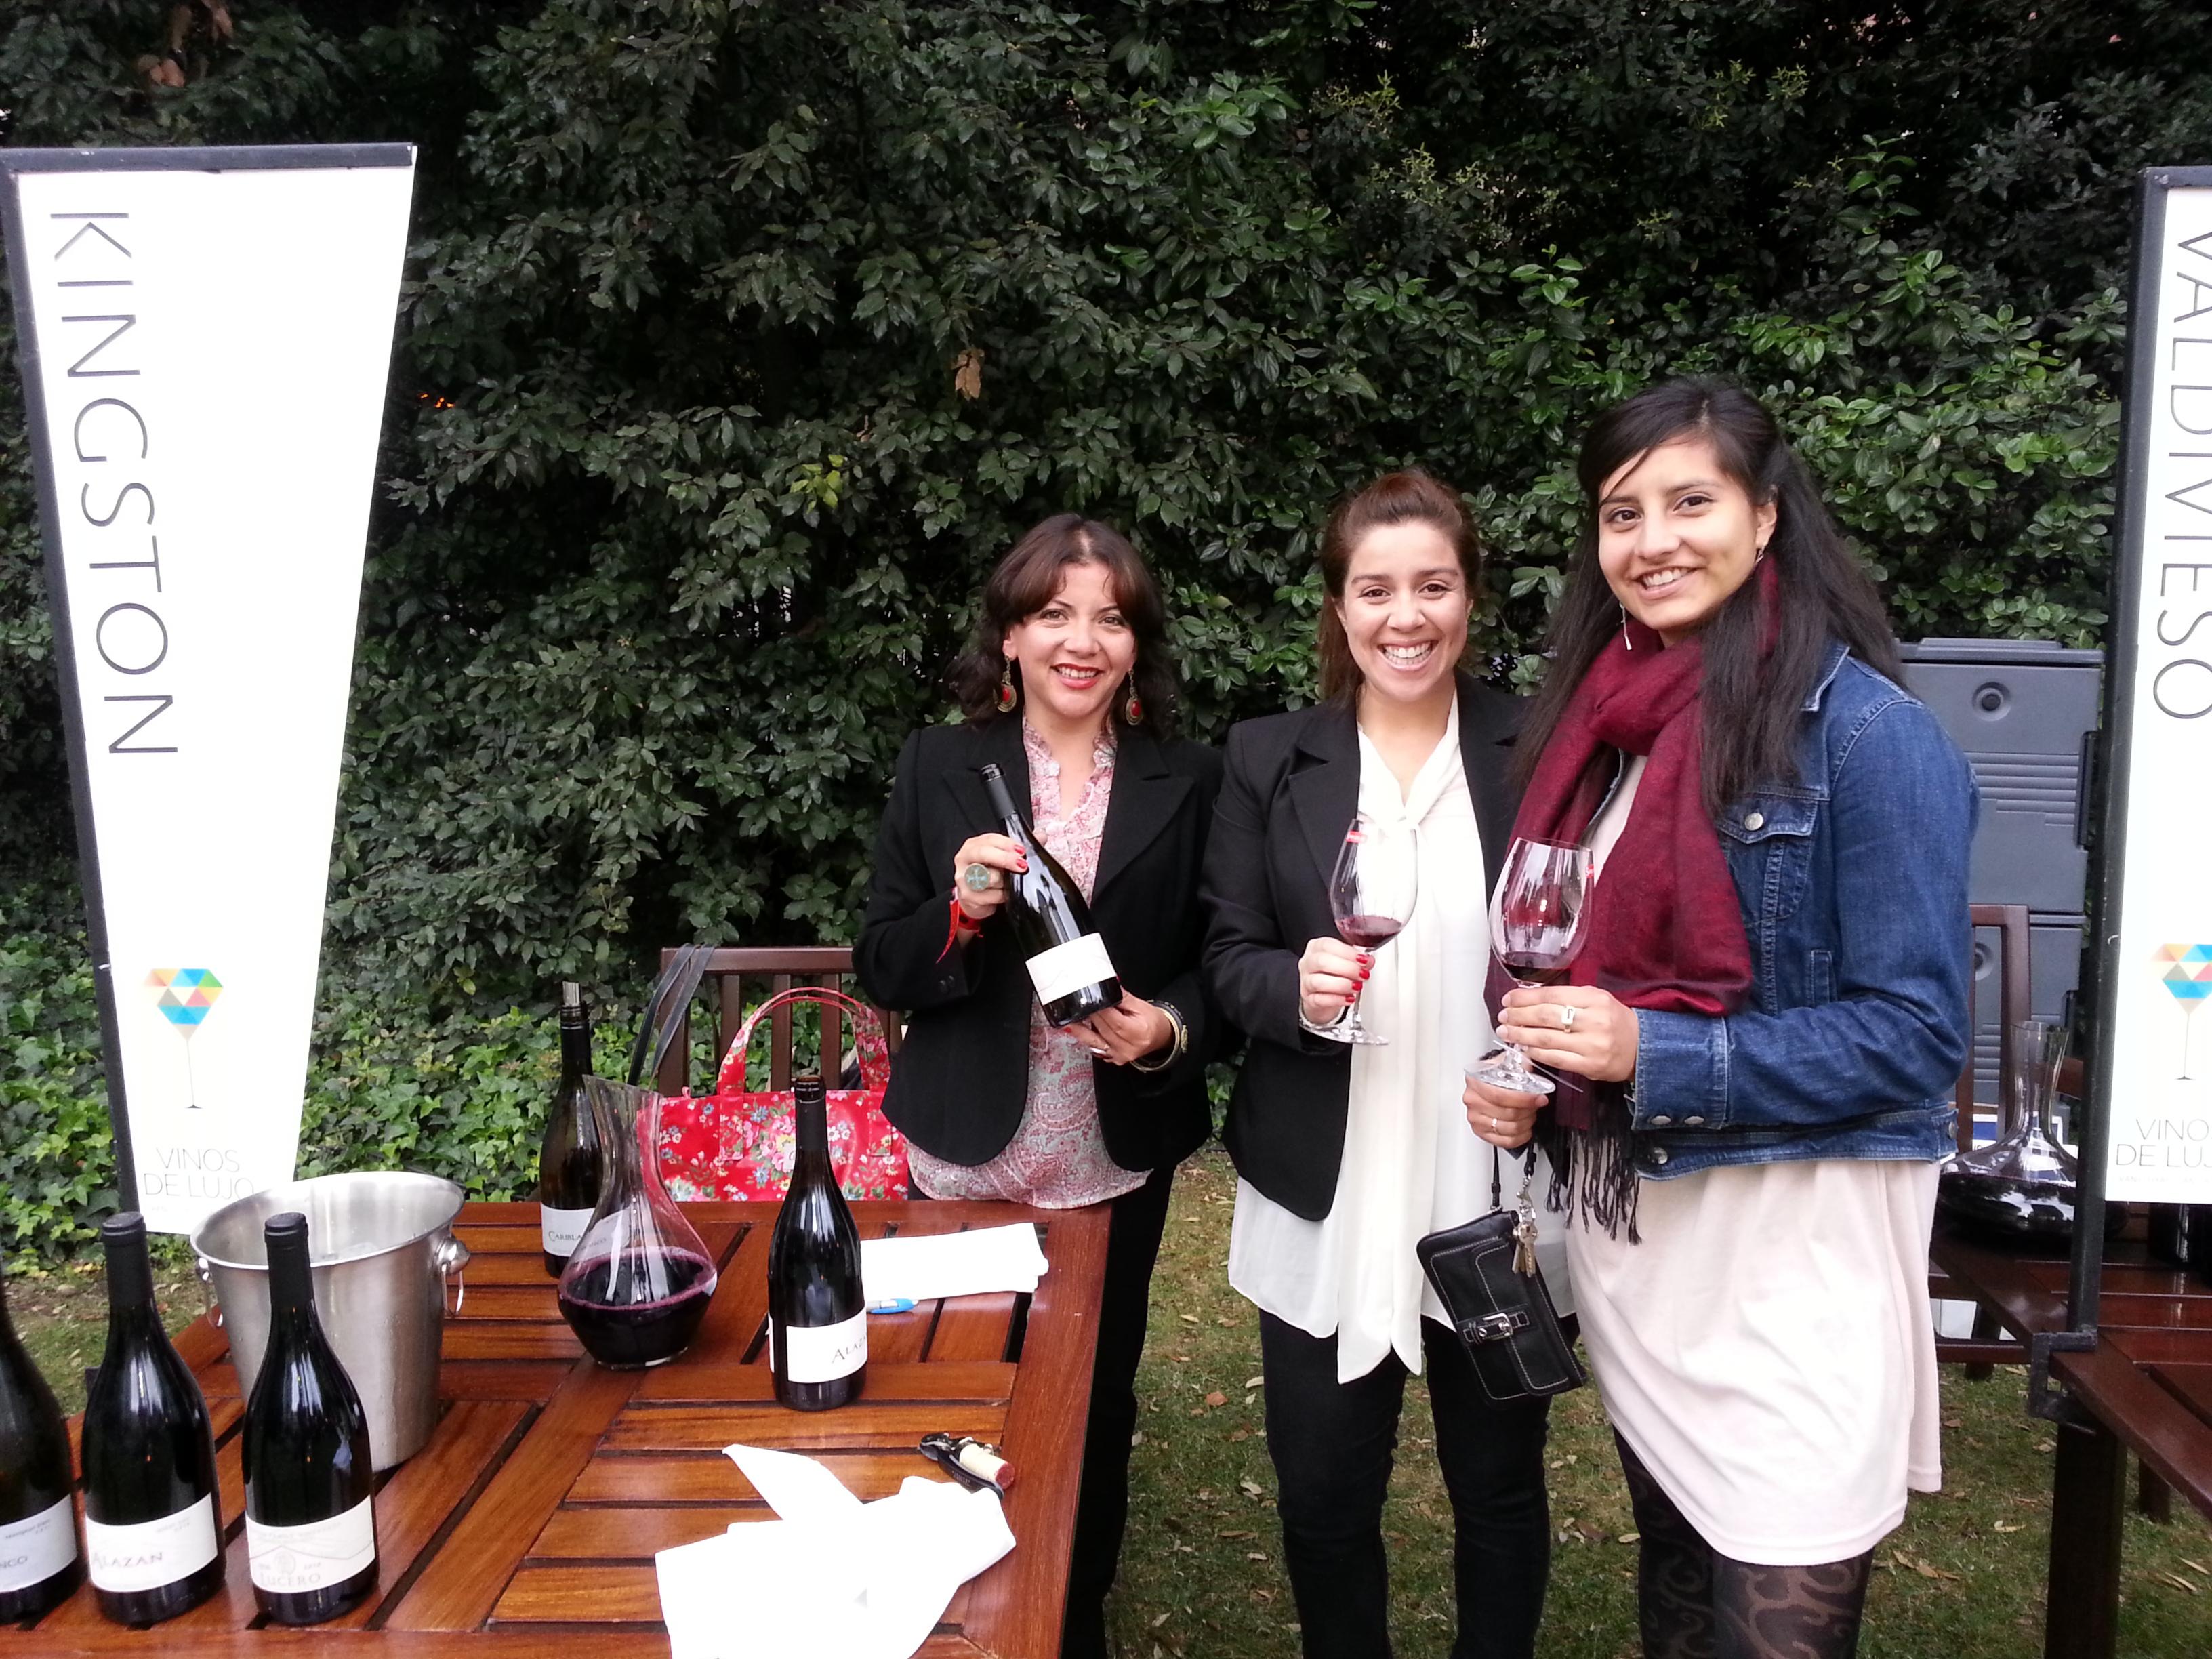 Kingston Family Vineyards at Descorchados Feria de Vinos de Lujo 2012